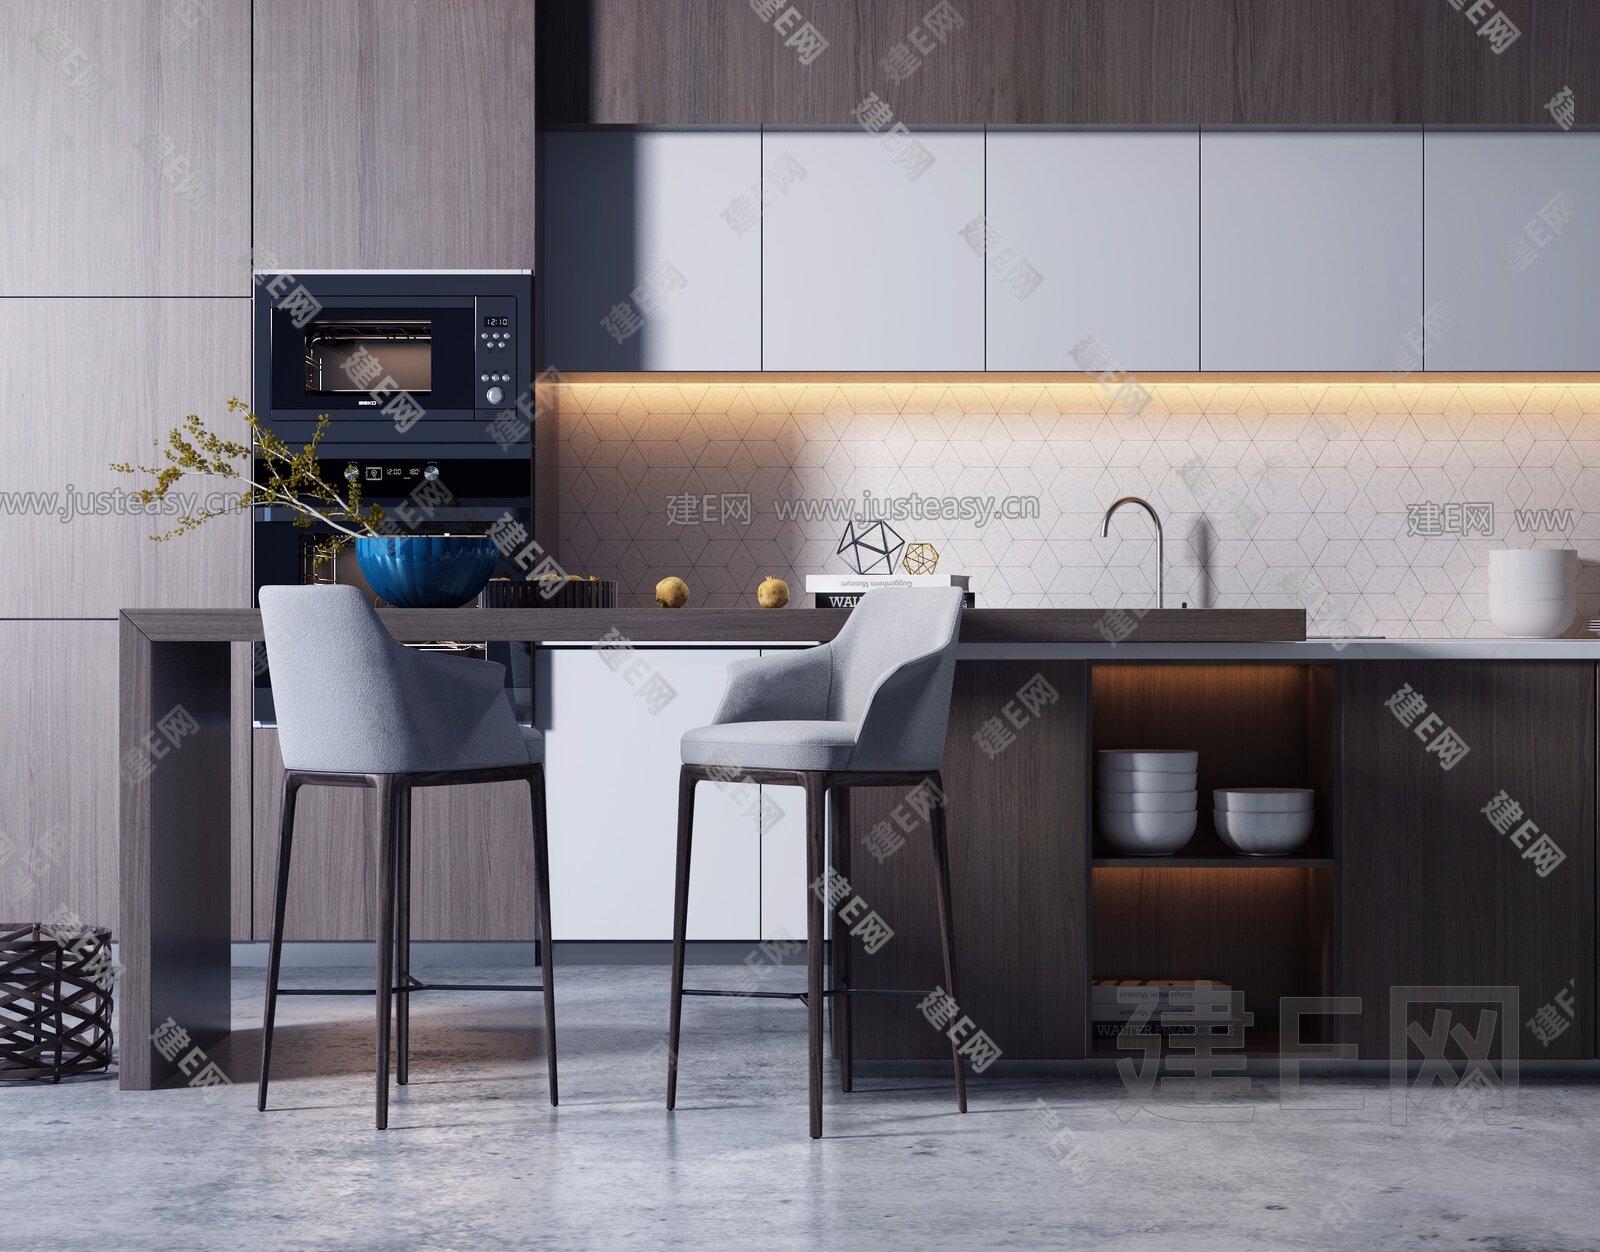 kitchen bar chairs personalized items 现代开放厨房吧台吧椅组合 建e网3d模型分享交流平台 3d模型下载 3d模型 现代开放厨房吧台吧椅组合3d模型